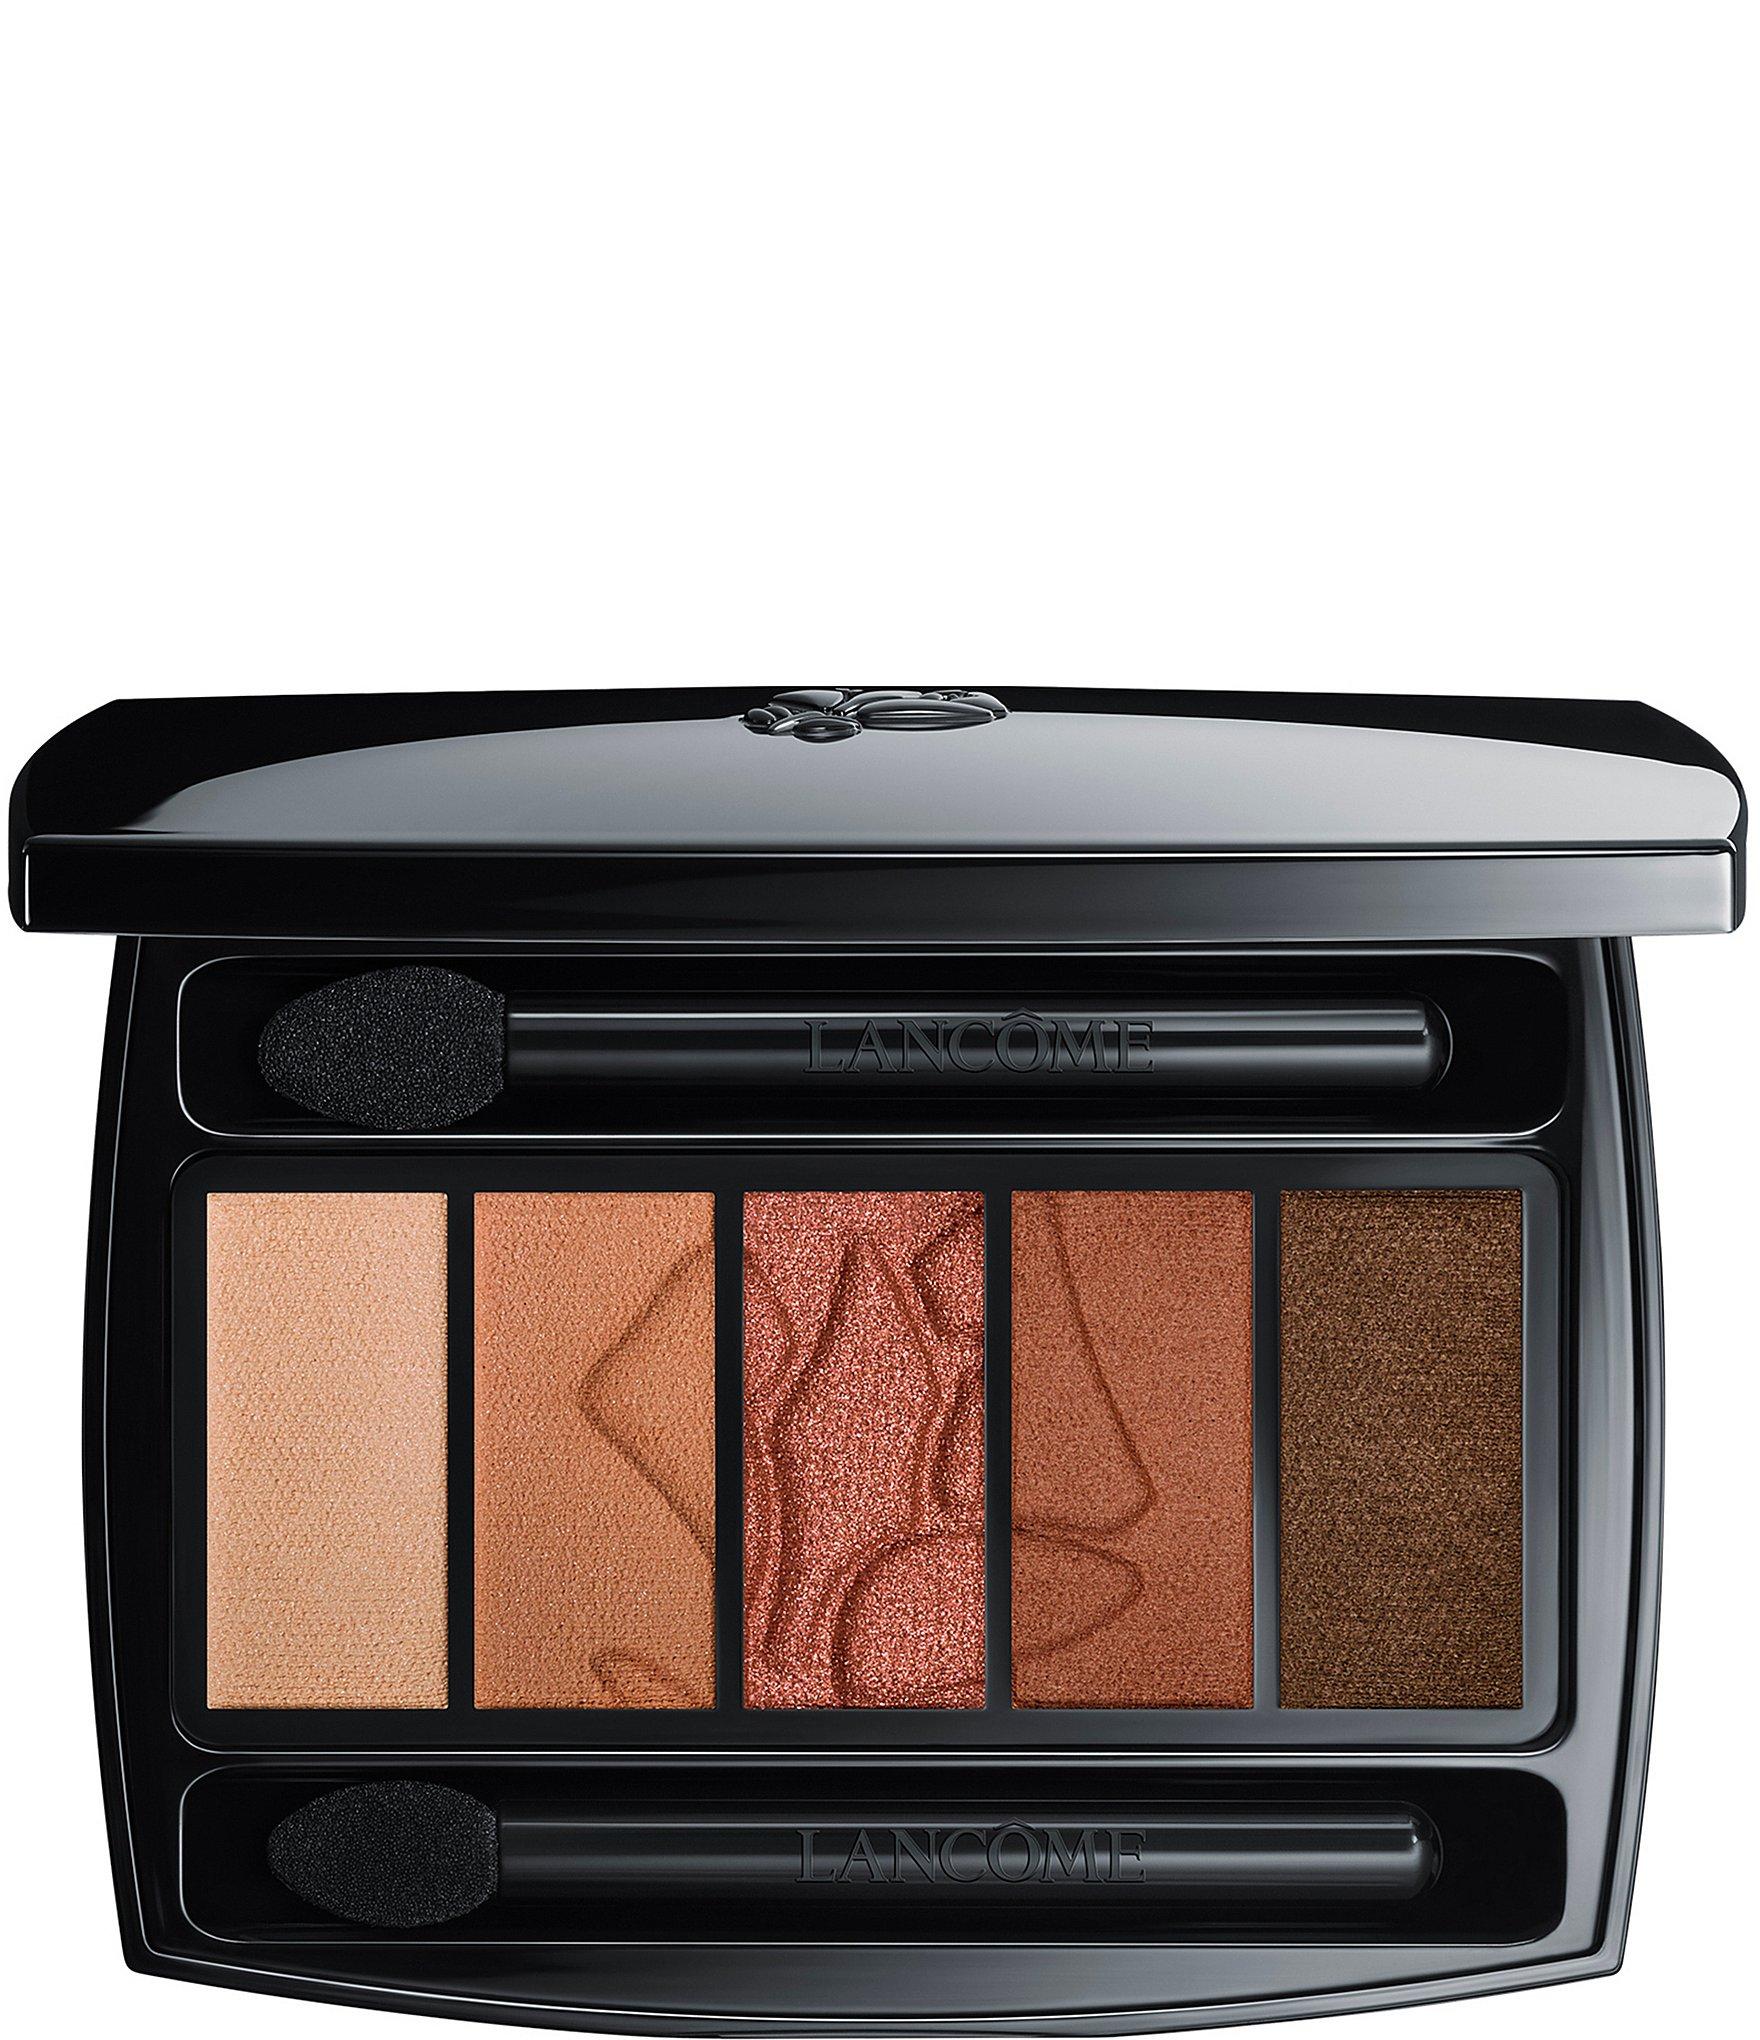 Patio En Bois De Palette lancome color design eye brightening all-in-one 5 shadow & liner palette |  dillard's